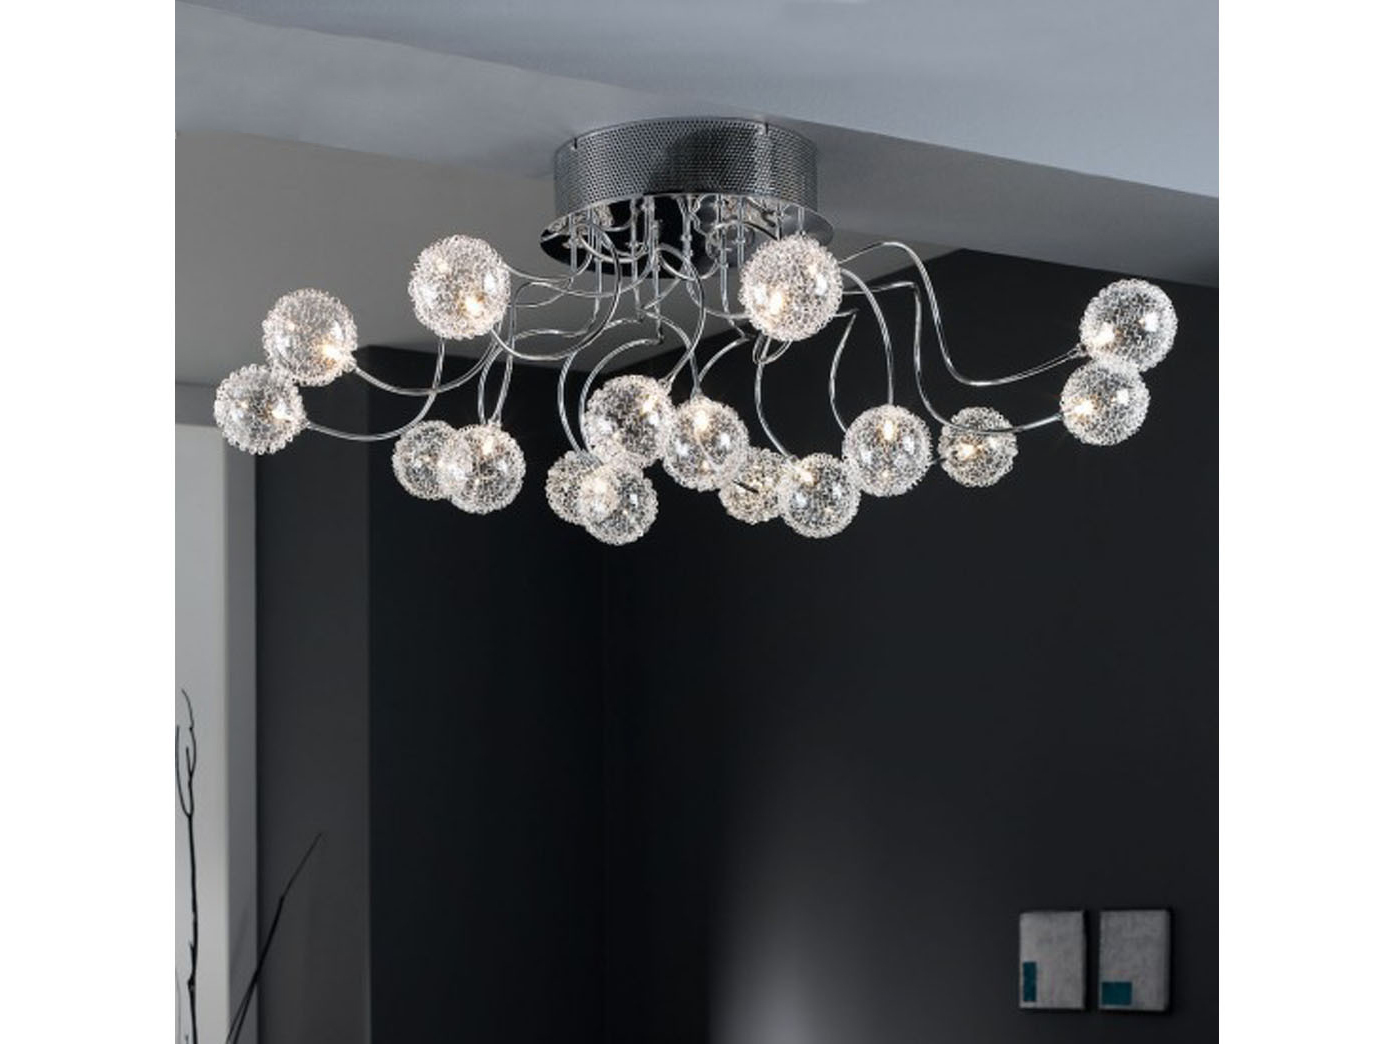 glaskugel mehr als 2000 angebote fotos preise seite 10. Black Bedroom Furniture Sets. Home Design Ideas